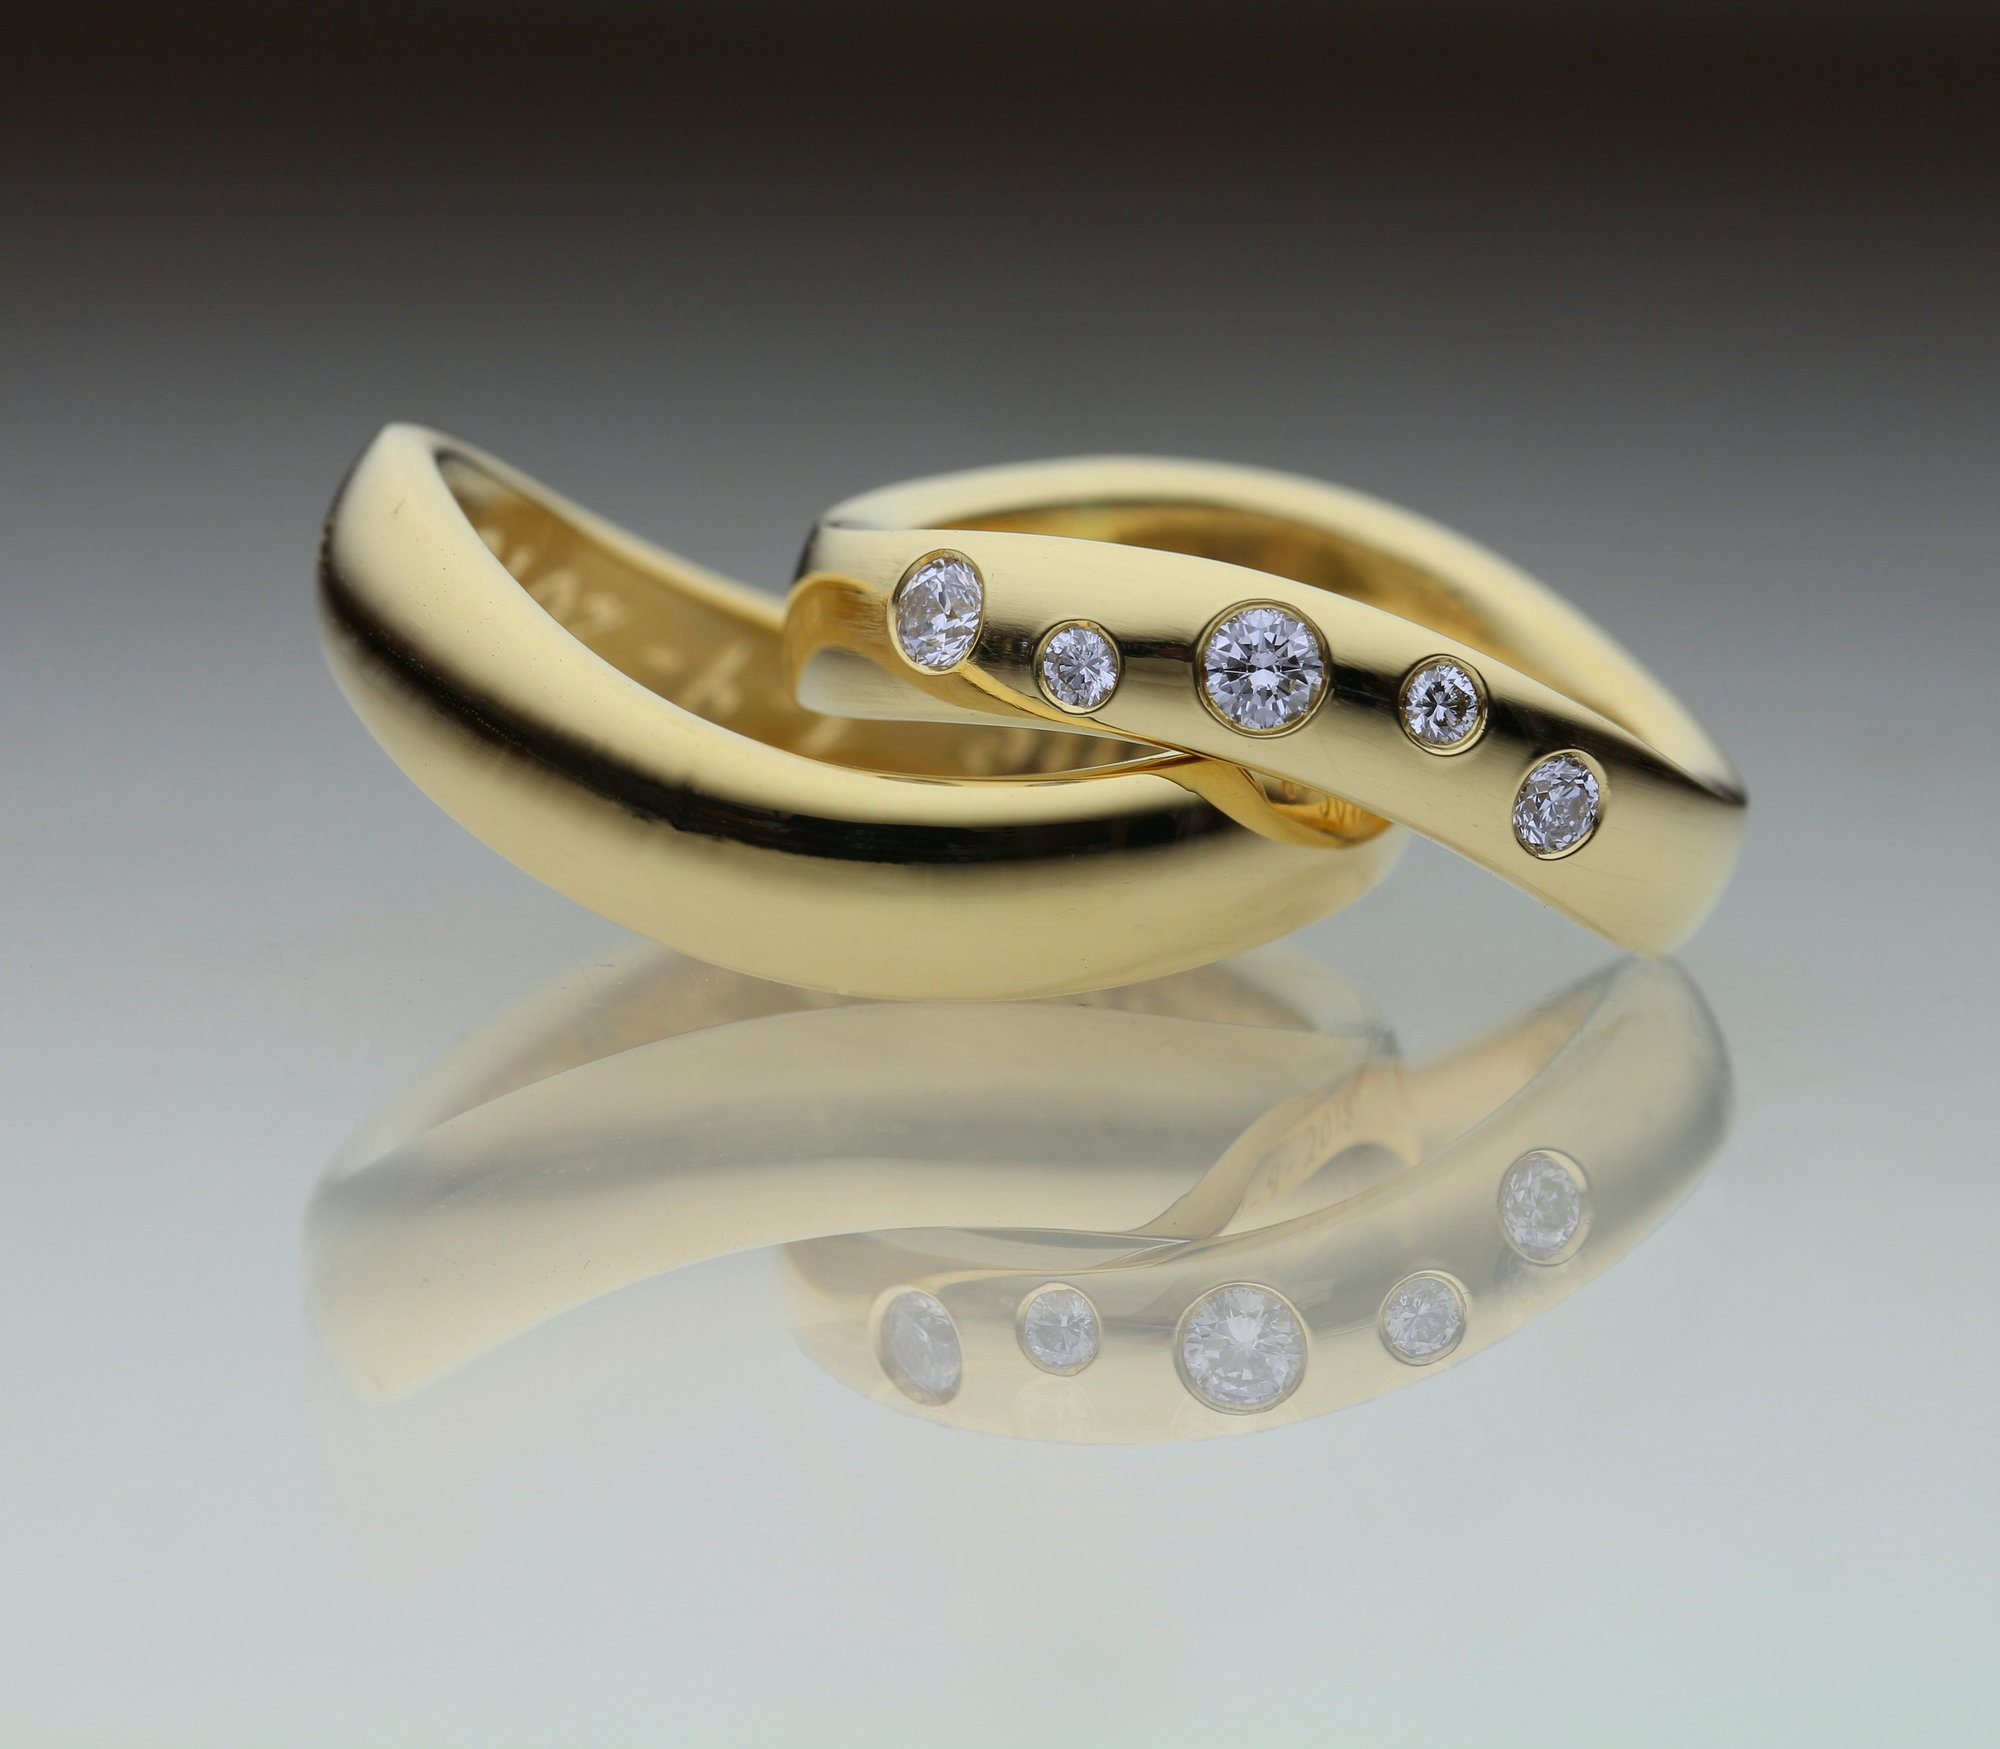 Forlovelsesring med buet blank overflade i guld med diamanter